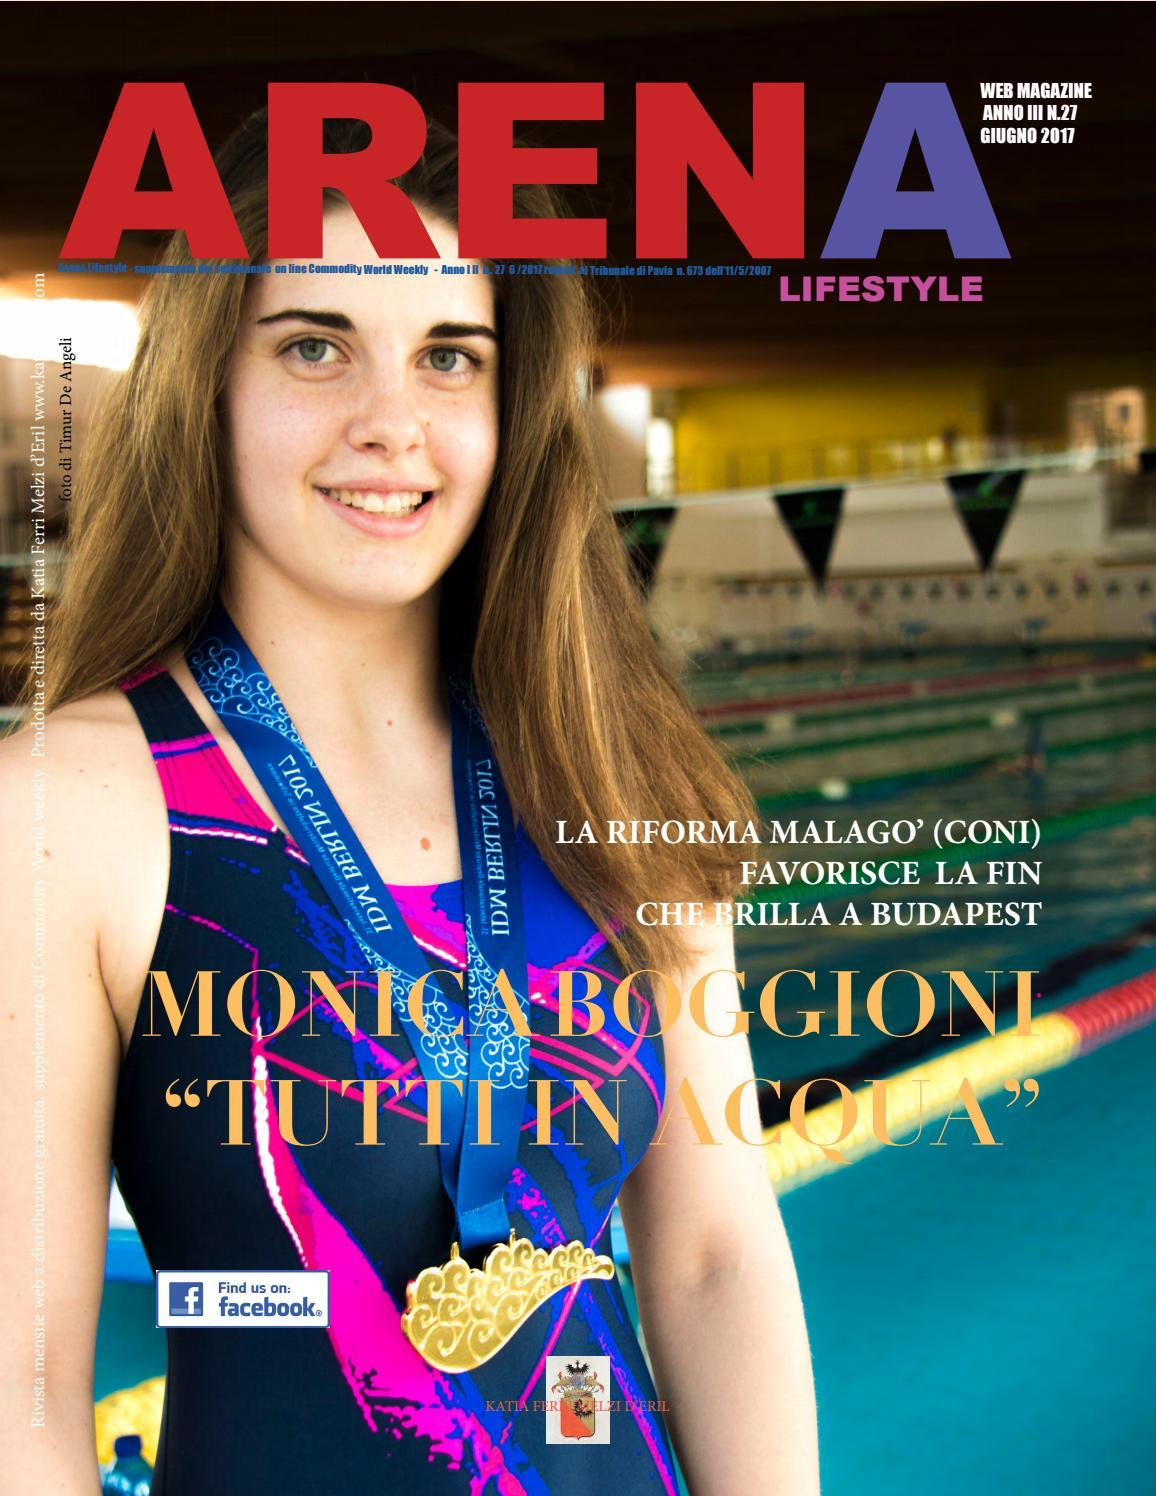 Arena lifestyle 7 8 2017 web by katia Ferri Melzi d Eril - issuu e7386fb07e0